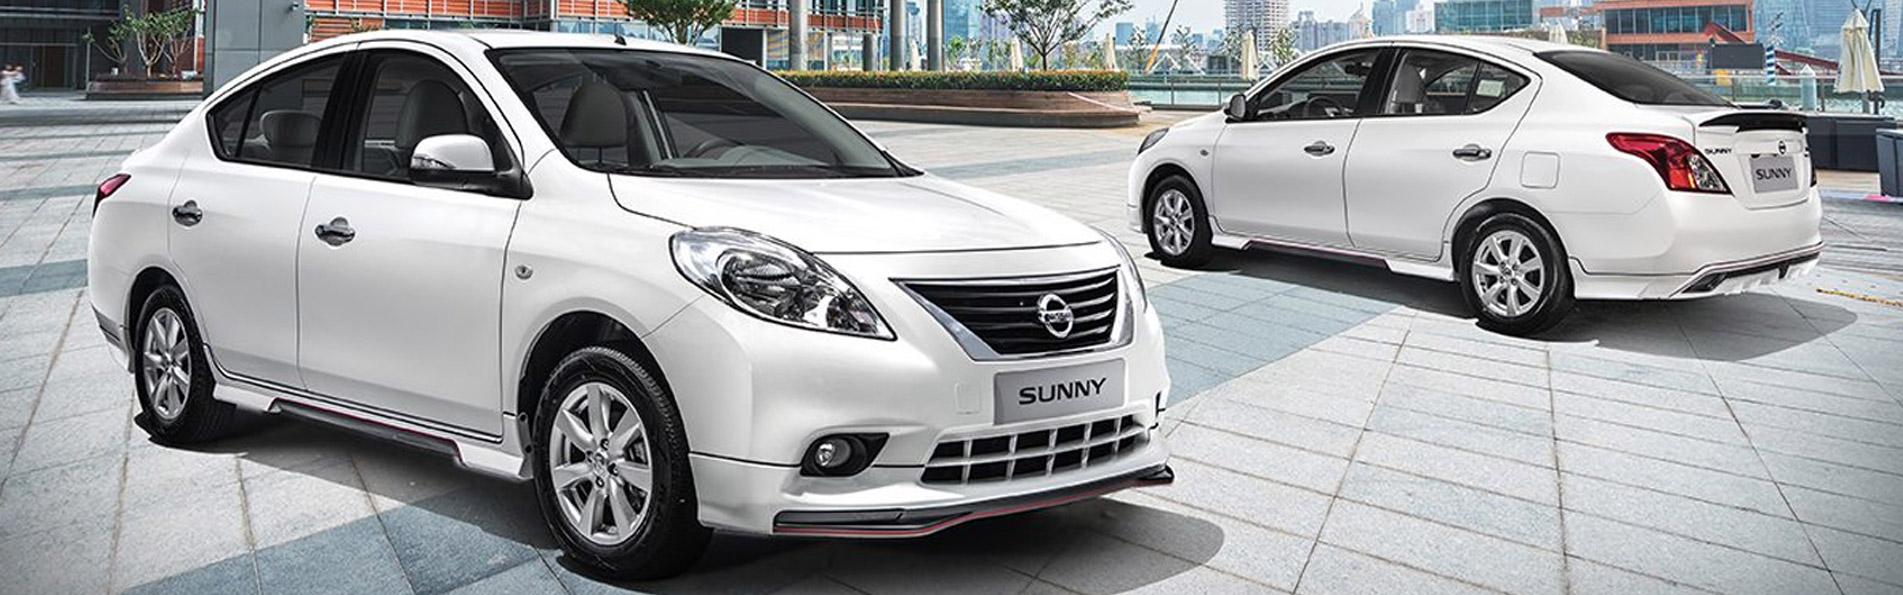 Ảnh ngoại thất Nissan Sunny XL-1